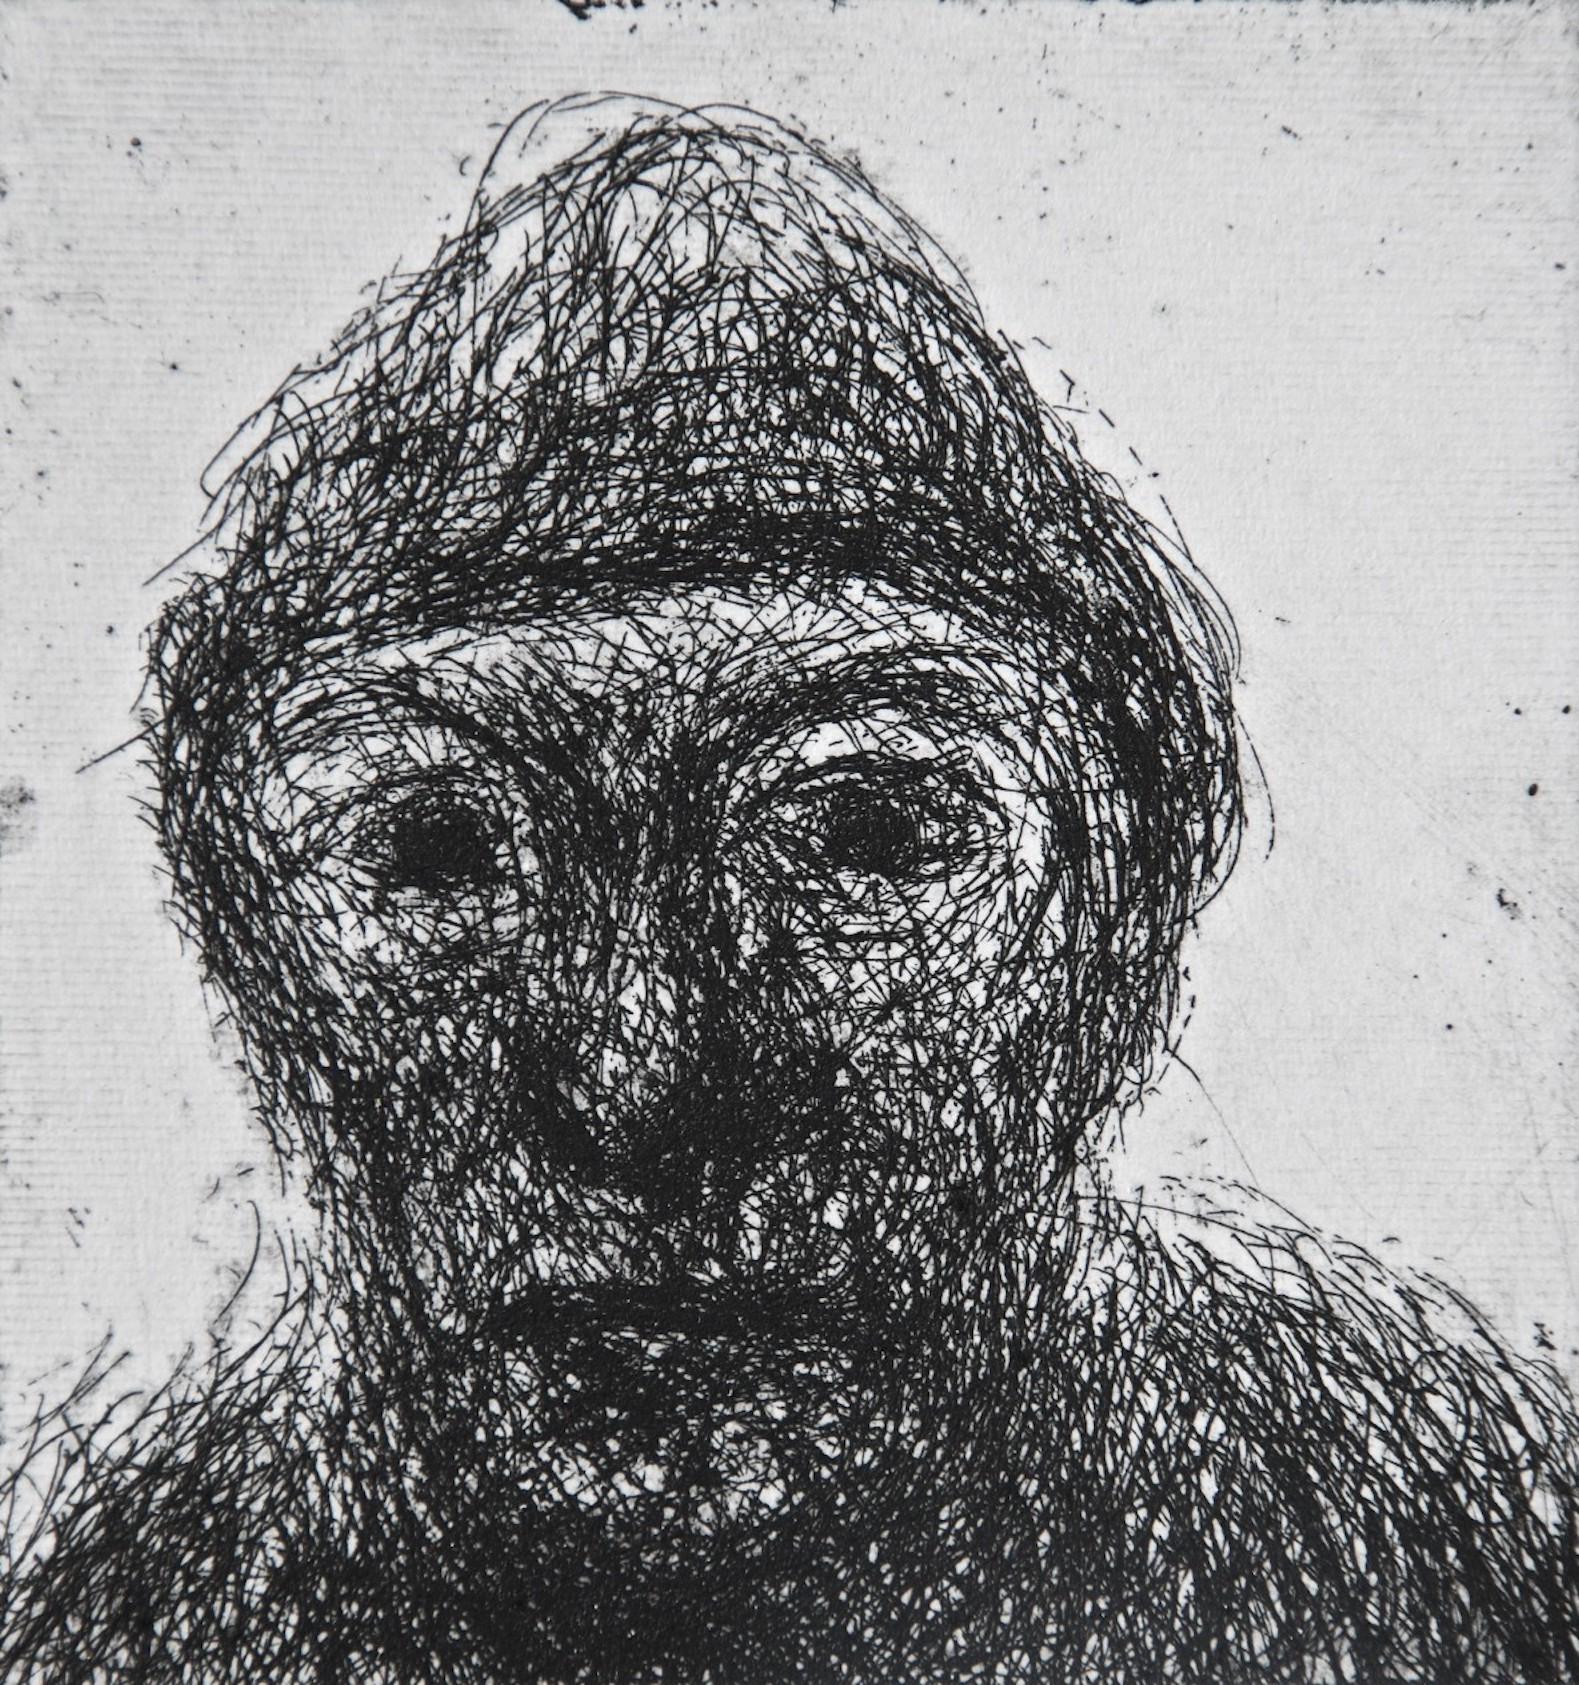 Mood 26, multi-states etching, 8.5 x 8 cm